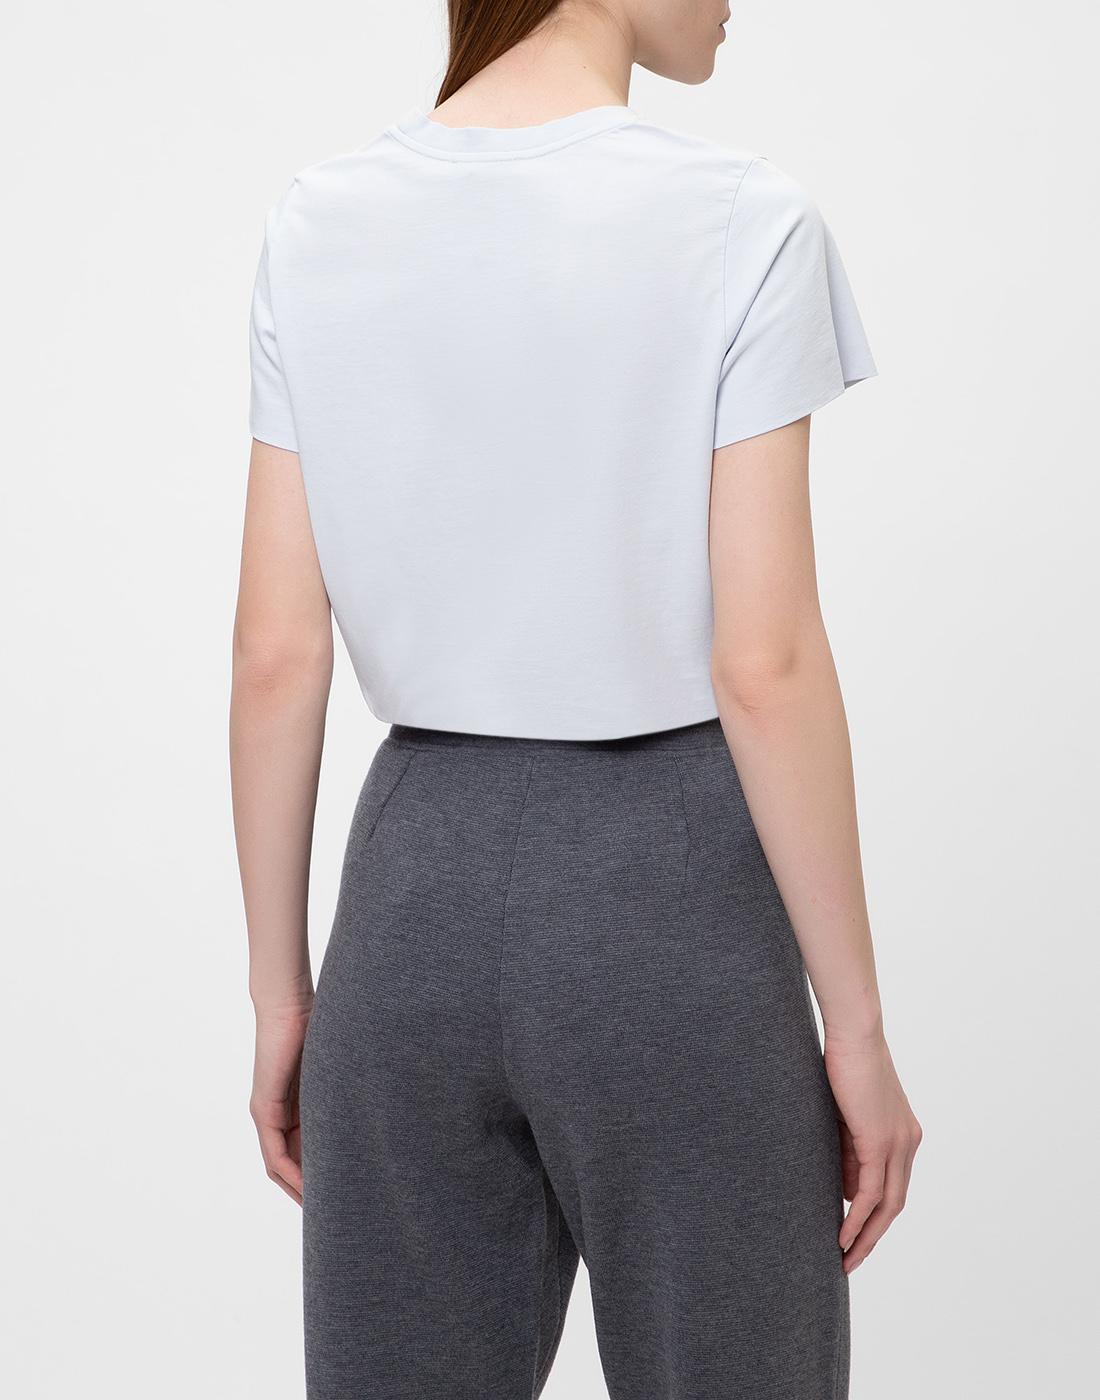 Женская голубая футболка  Dorothee Schumacher S623001/801-4